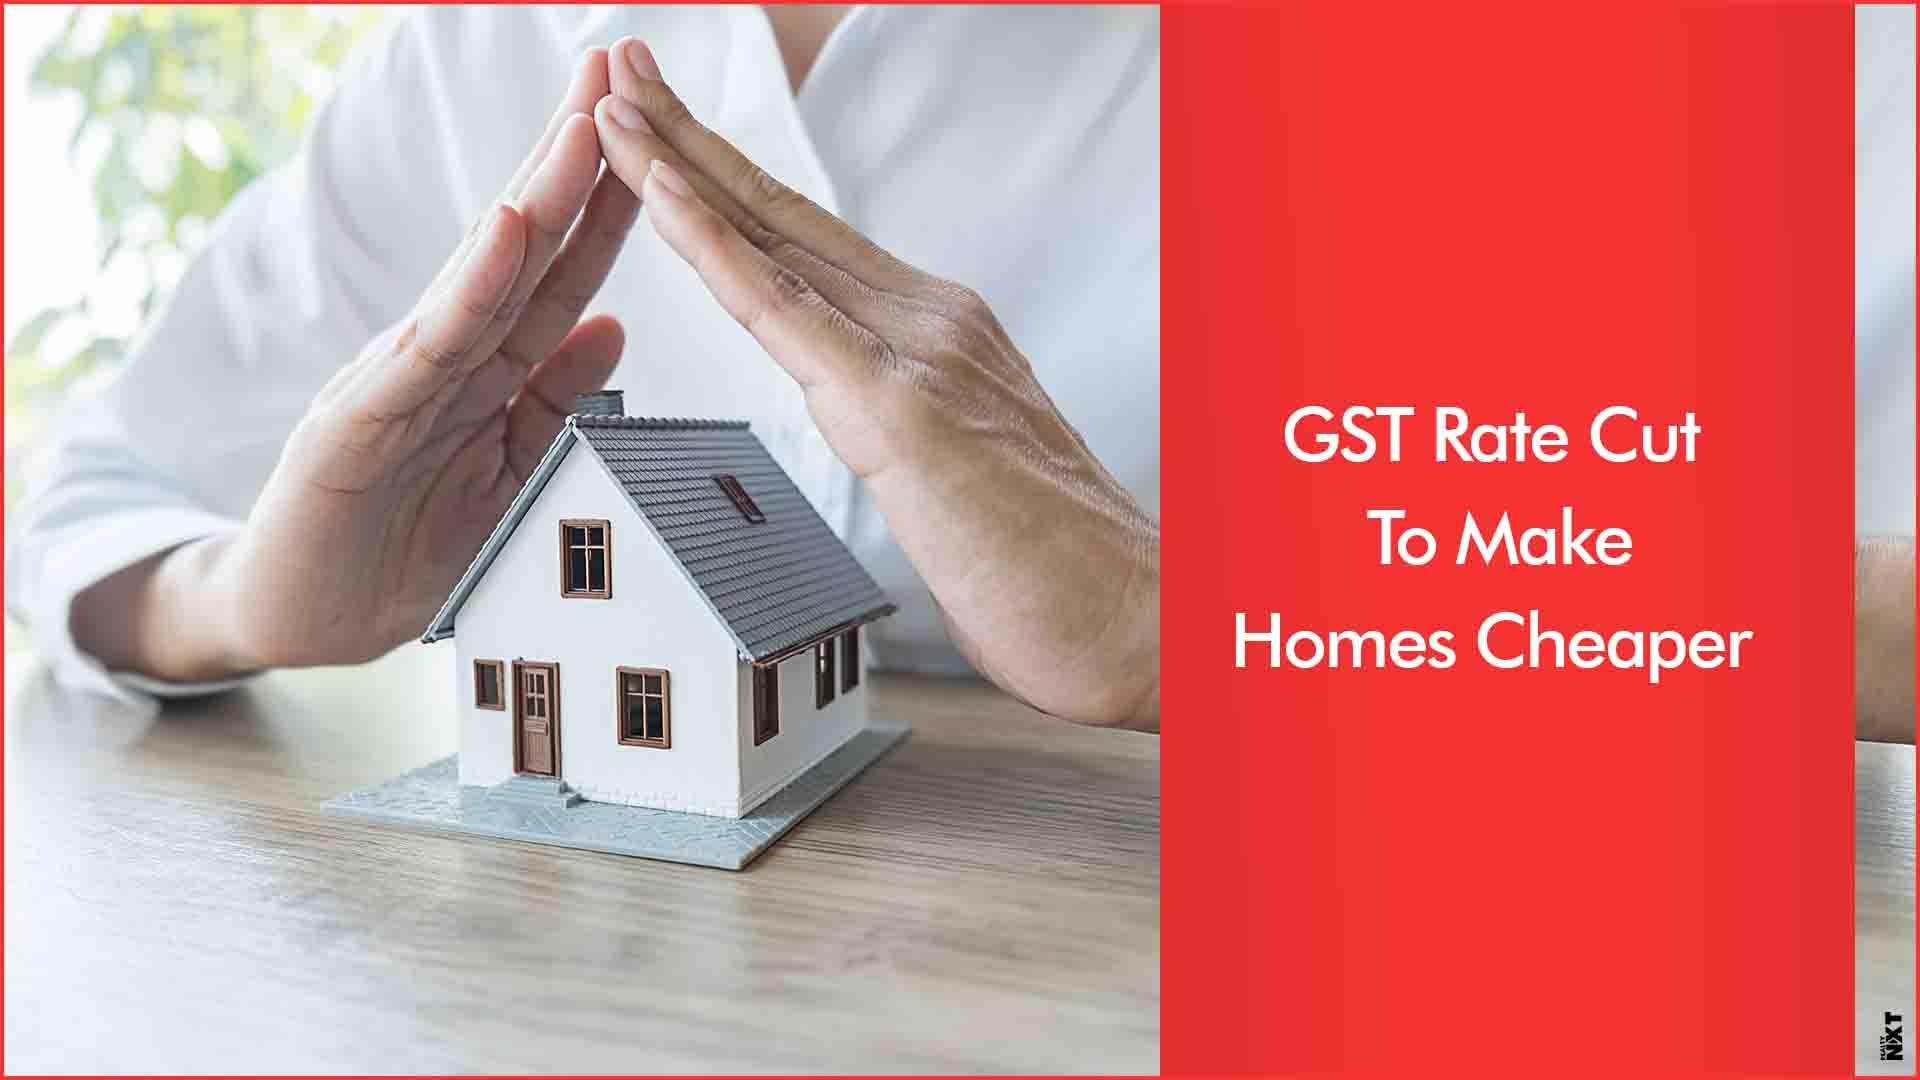 GST Rate Cut Brings Major Joy To Tier II And Tier III Cities